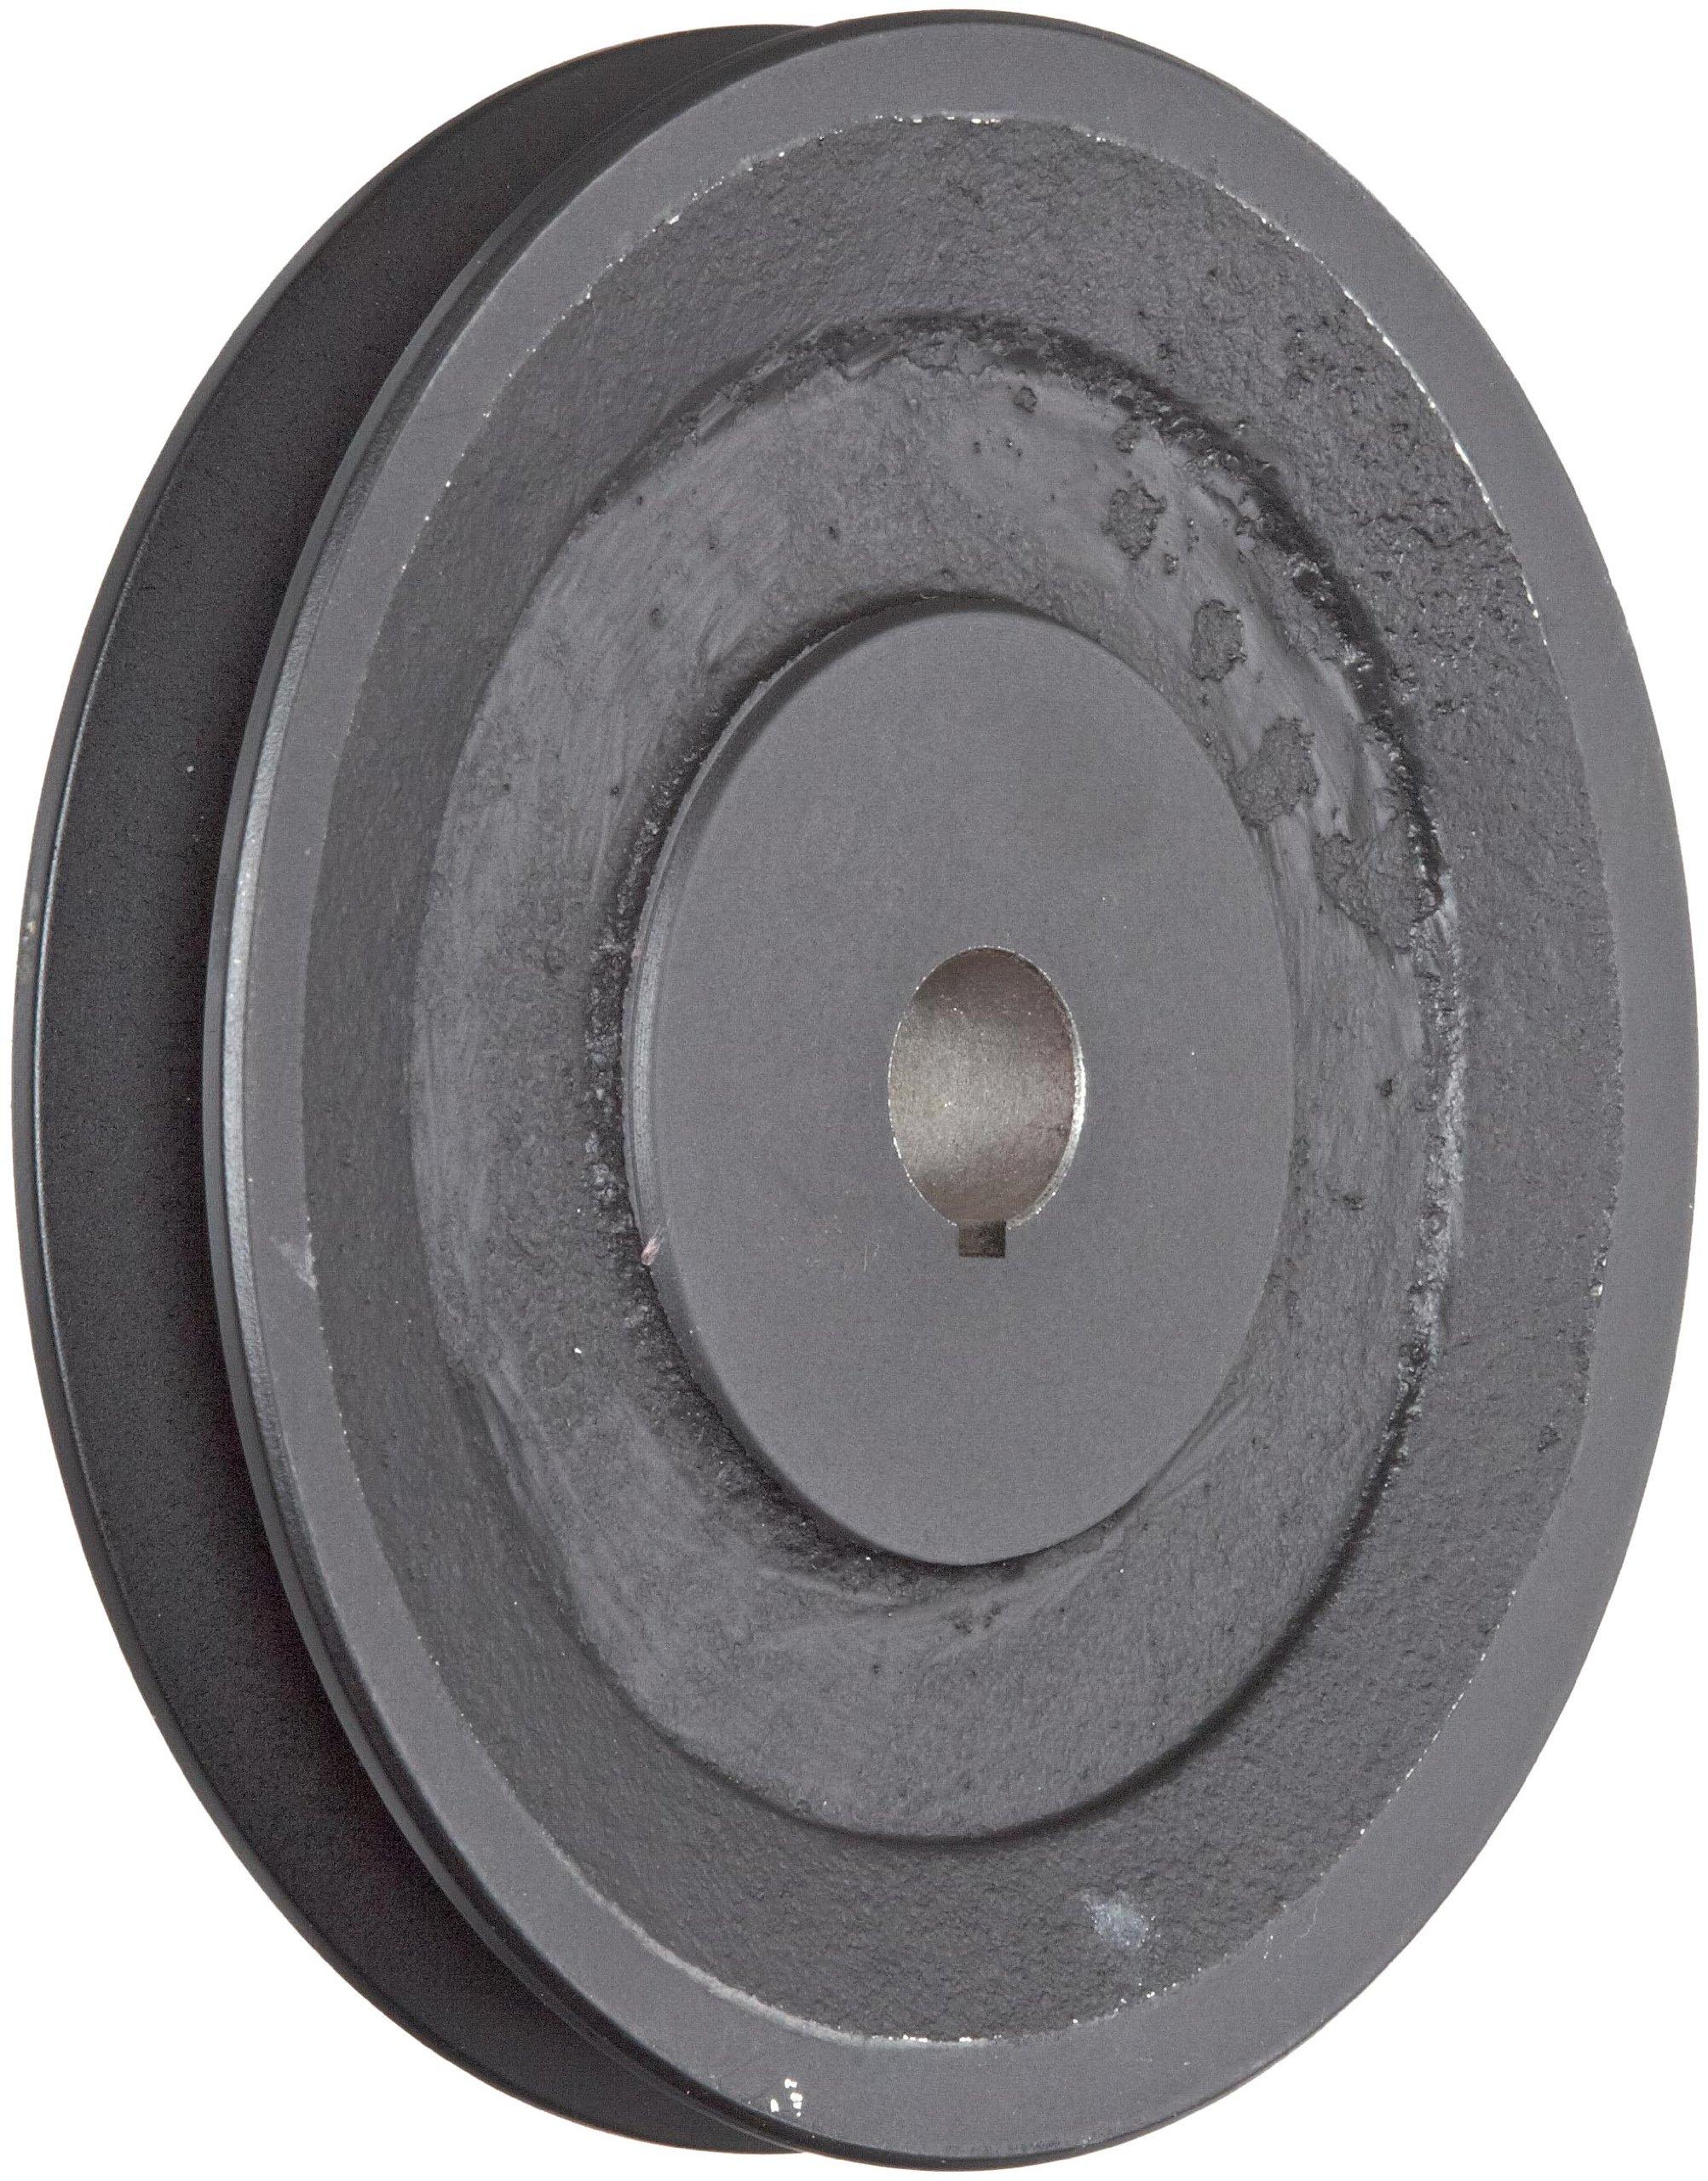 Martin BK62 3/4 FHP Sheave BS, 4L/5L or B Belt Section, 1 Groove, 3/4'' Bore, Class 30 Gray Cast Iron, 5.95'' OD, 4170 max rpm, 5.2 Datum/5.6 Datum